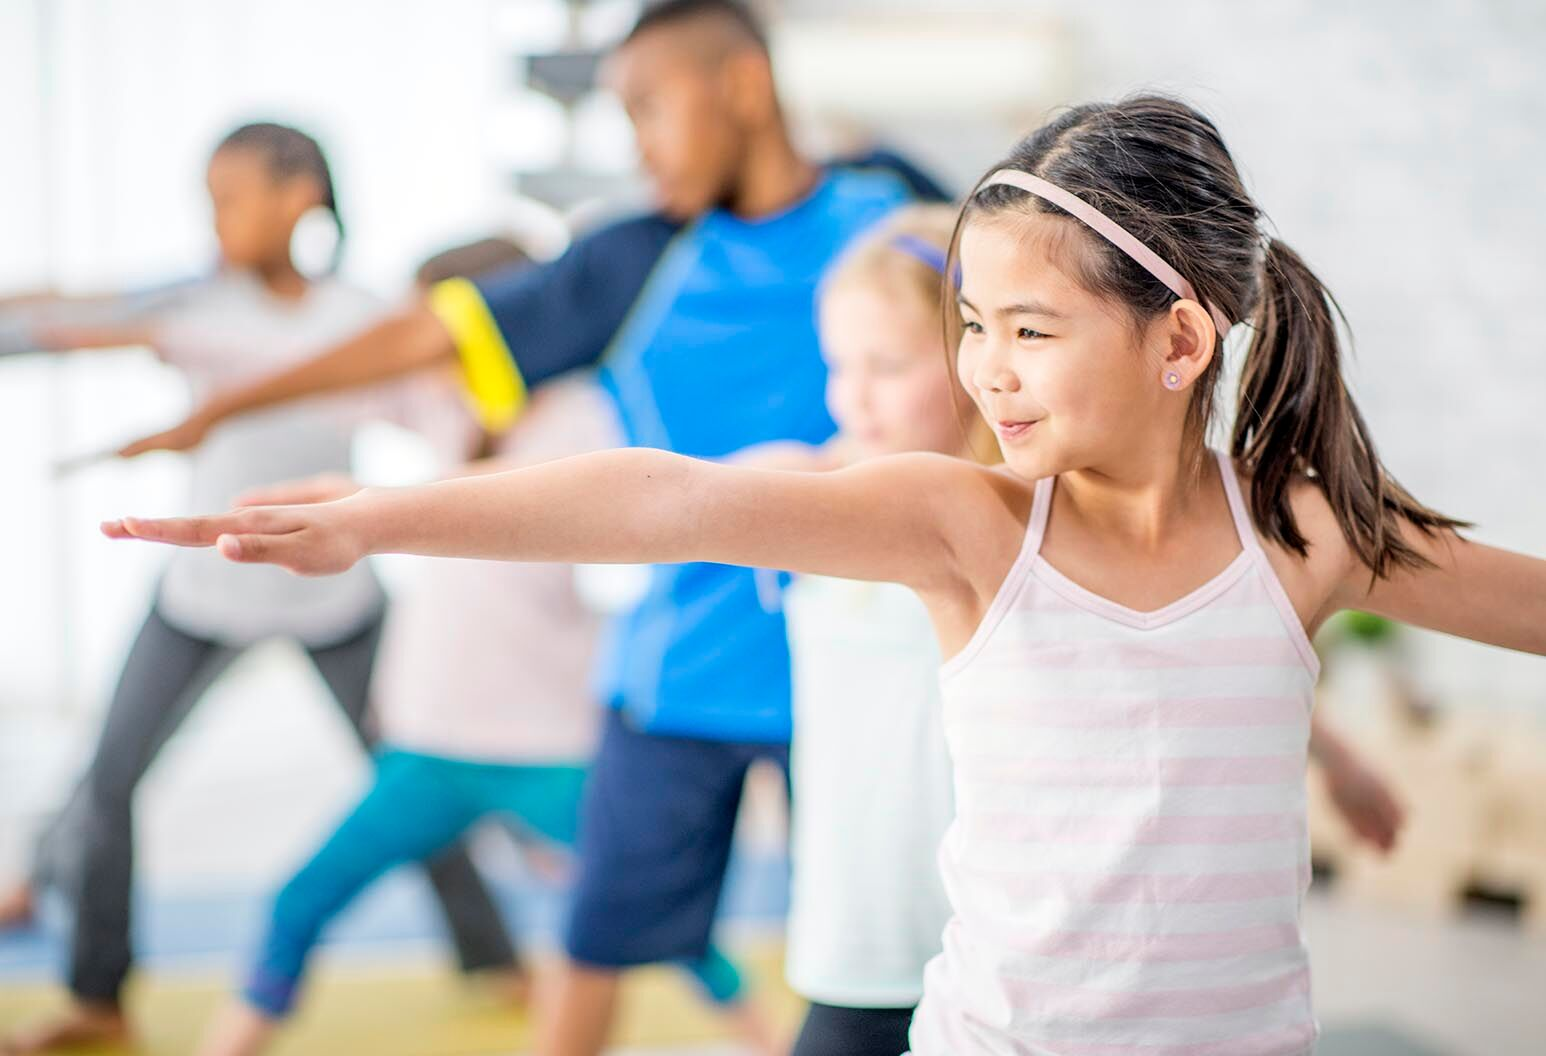 School-aged children exercise